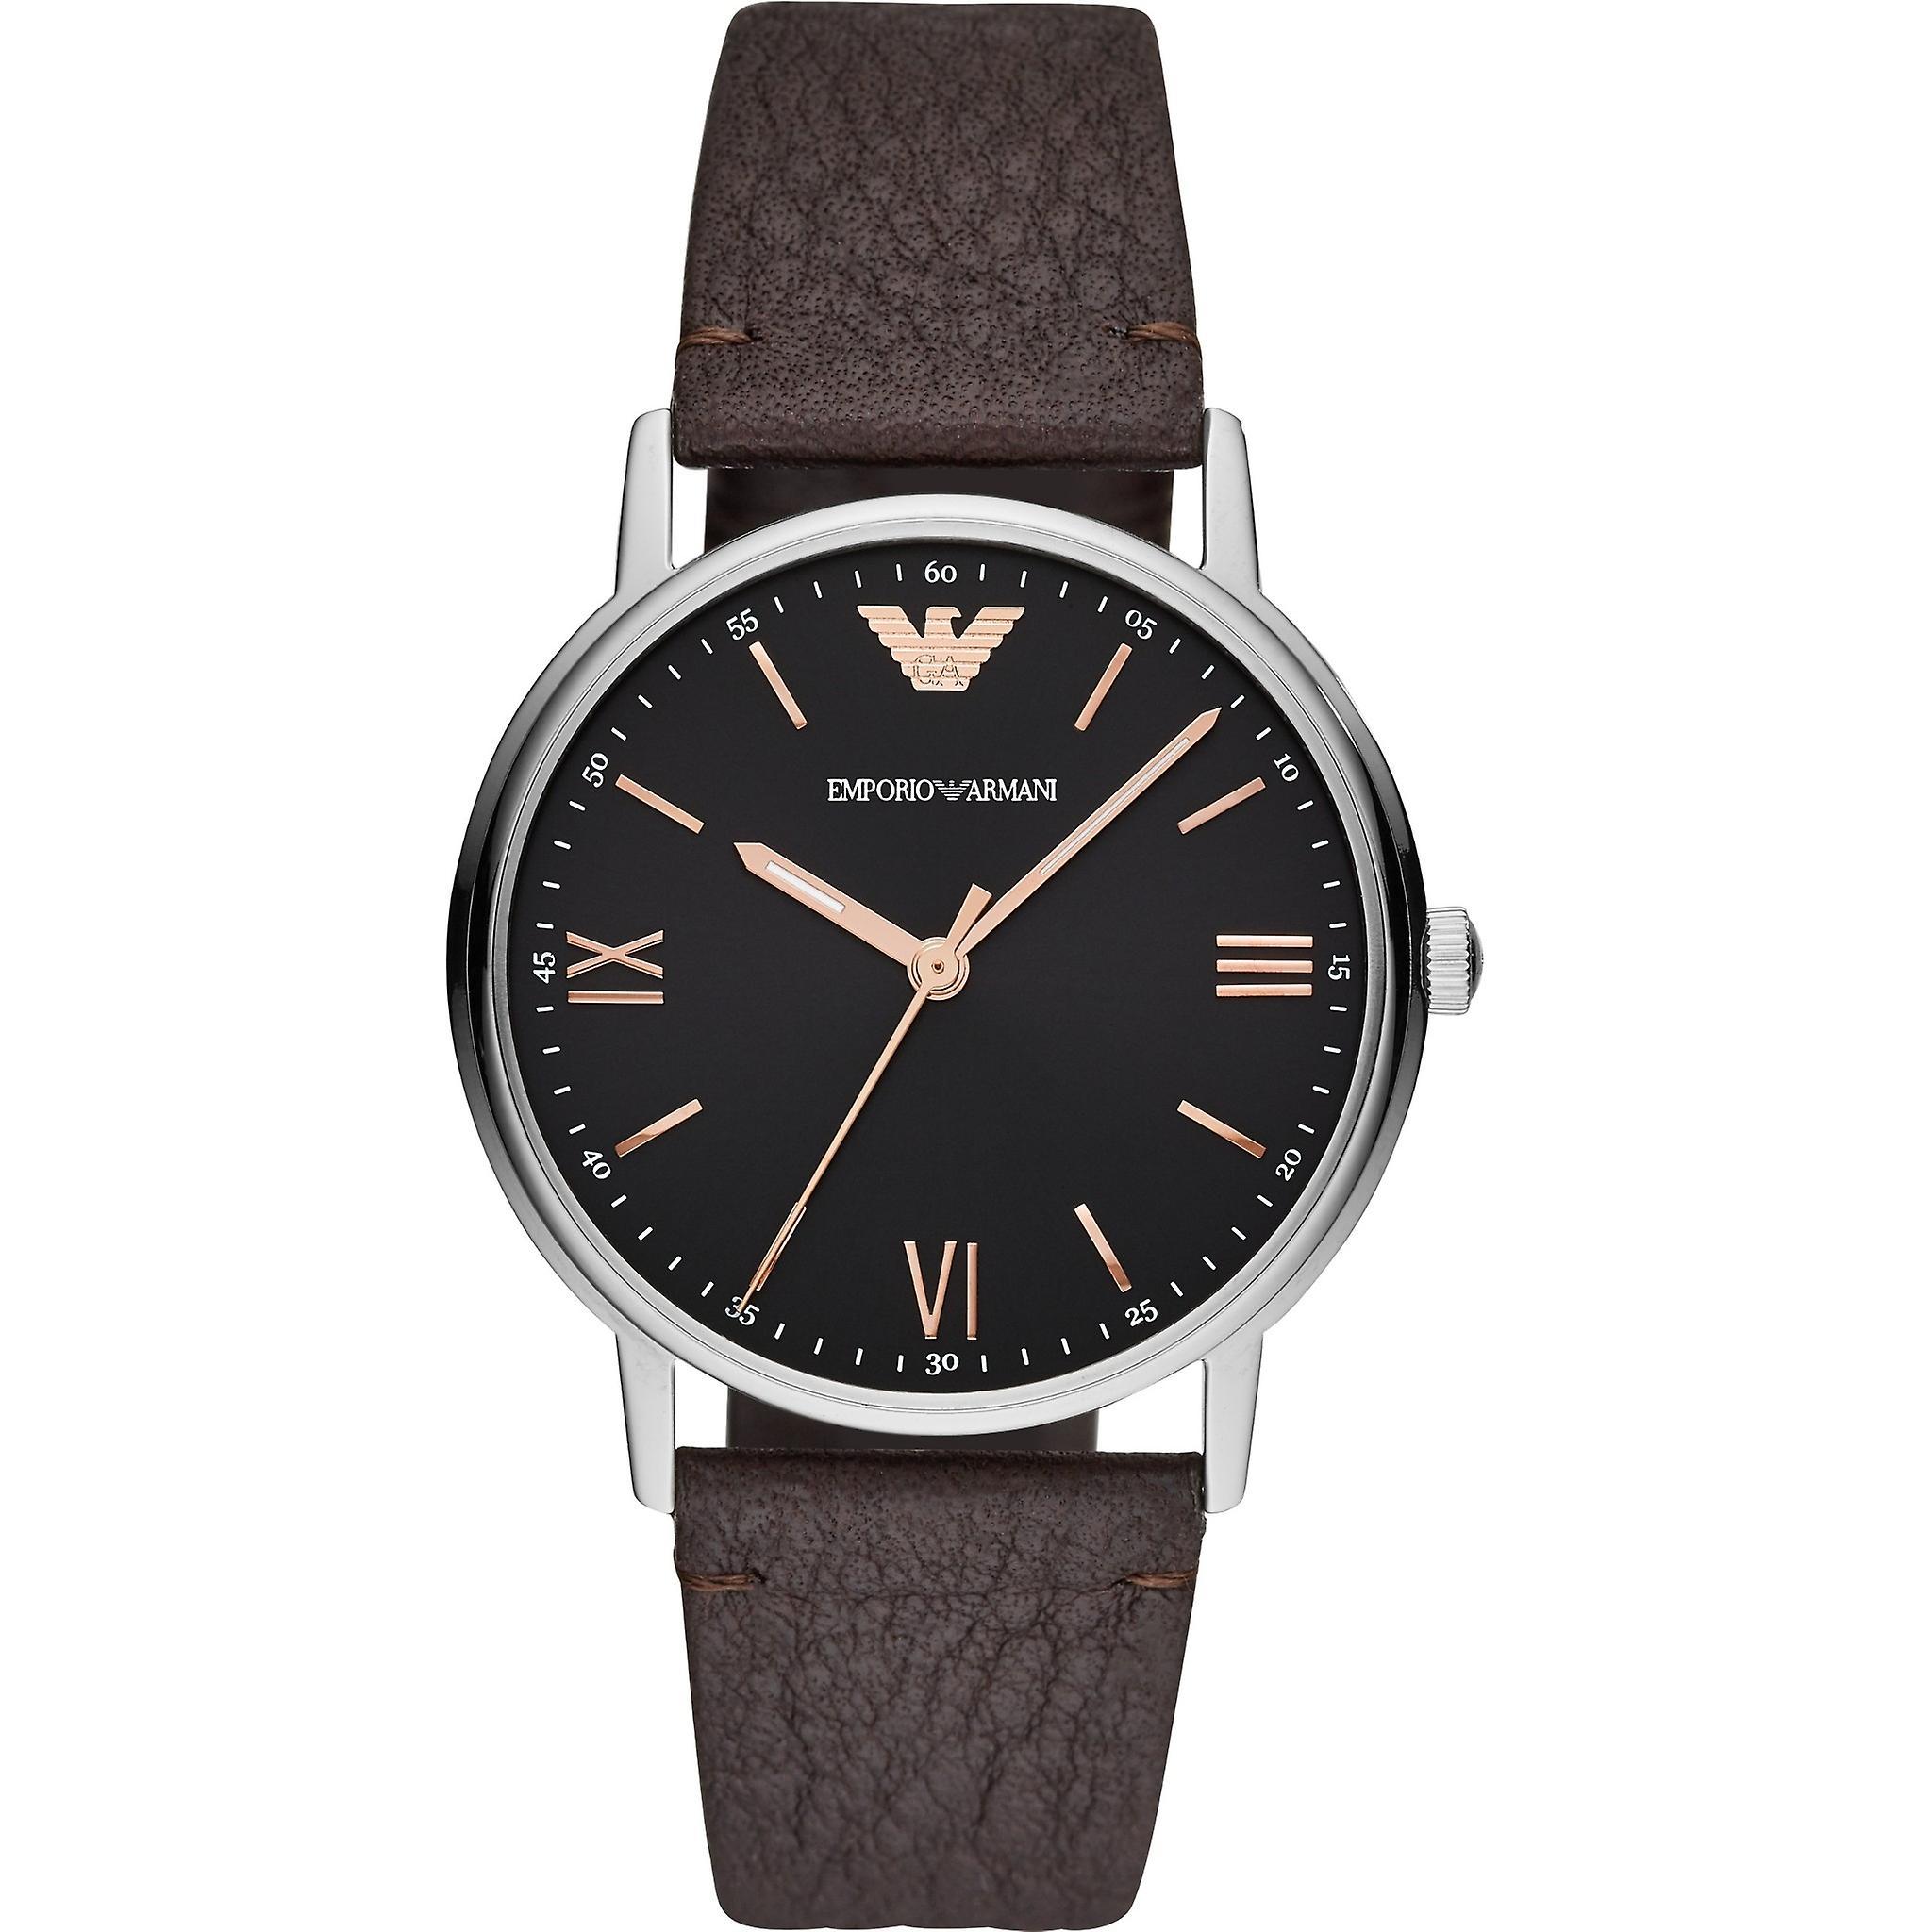 Emporio Armani Ar11153 Black Dial Brown Leather Strap Men's Watch